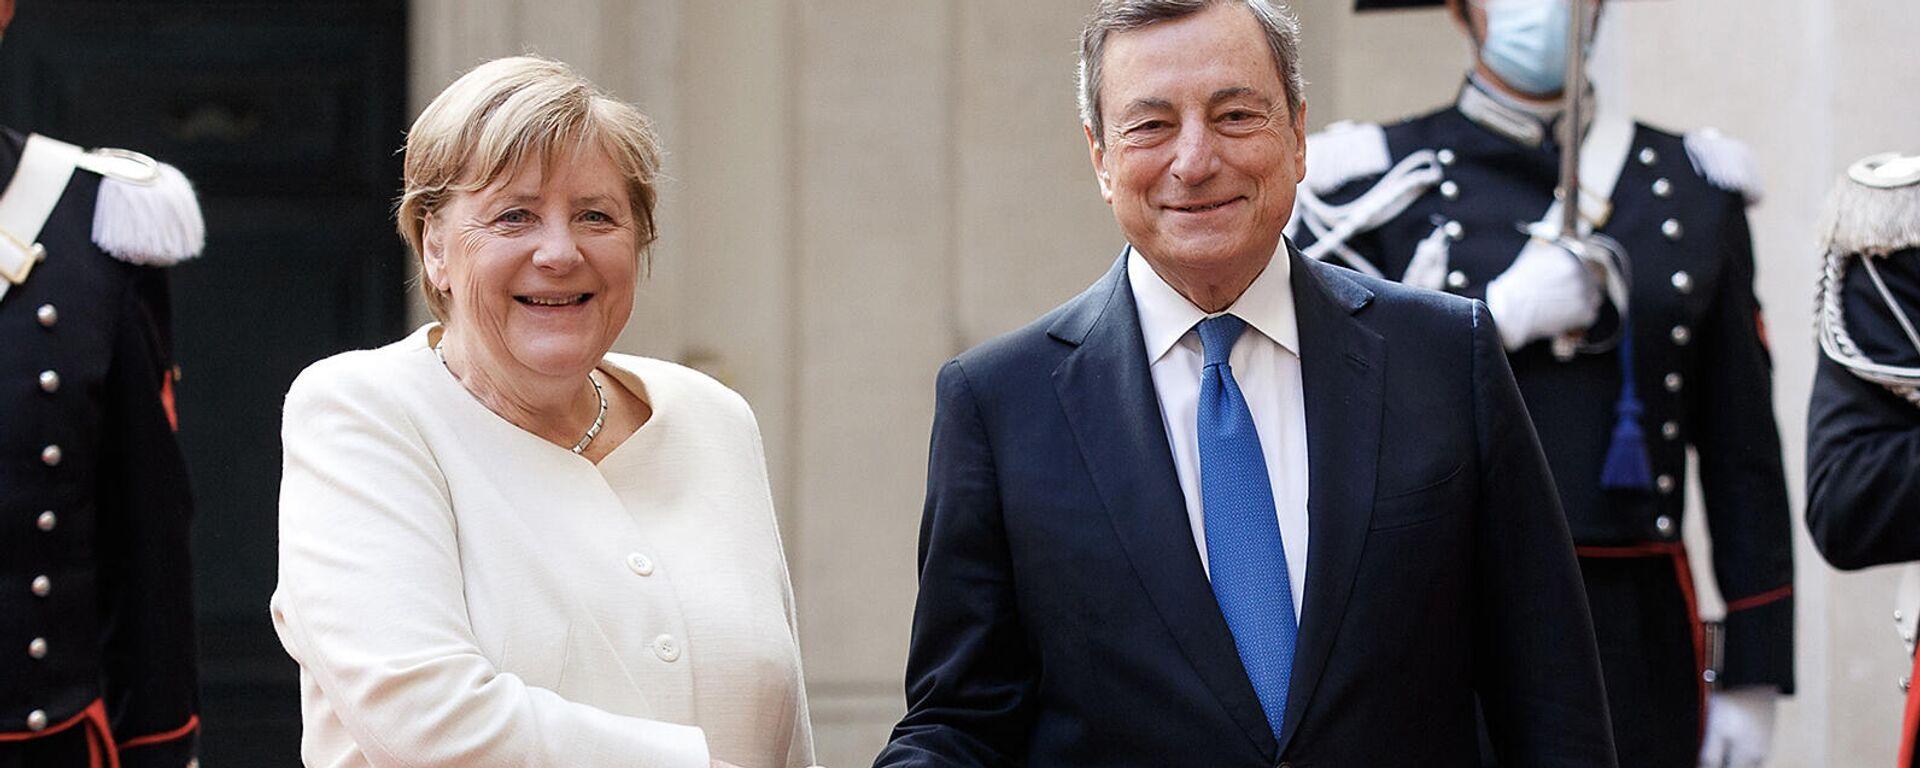 Draghi incontra la Cancelliera Merkel - Sputnik Italia, 1920, 07.10.2021